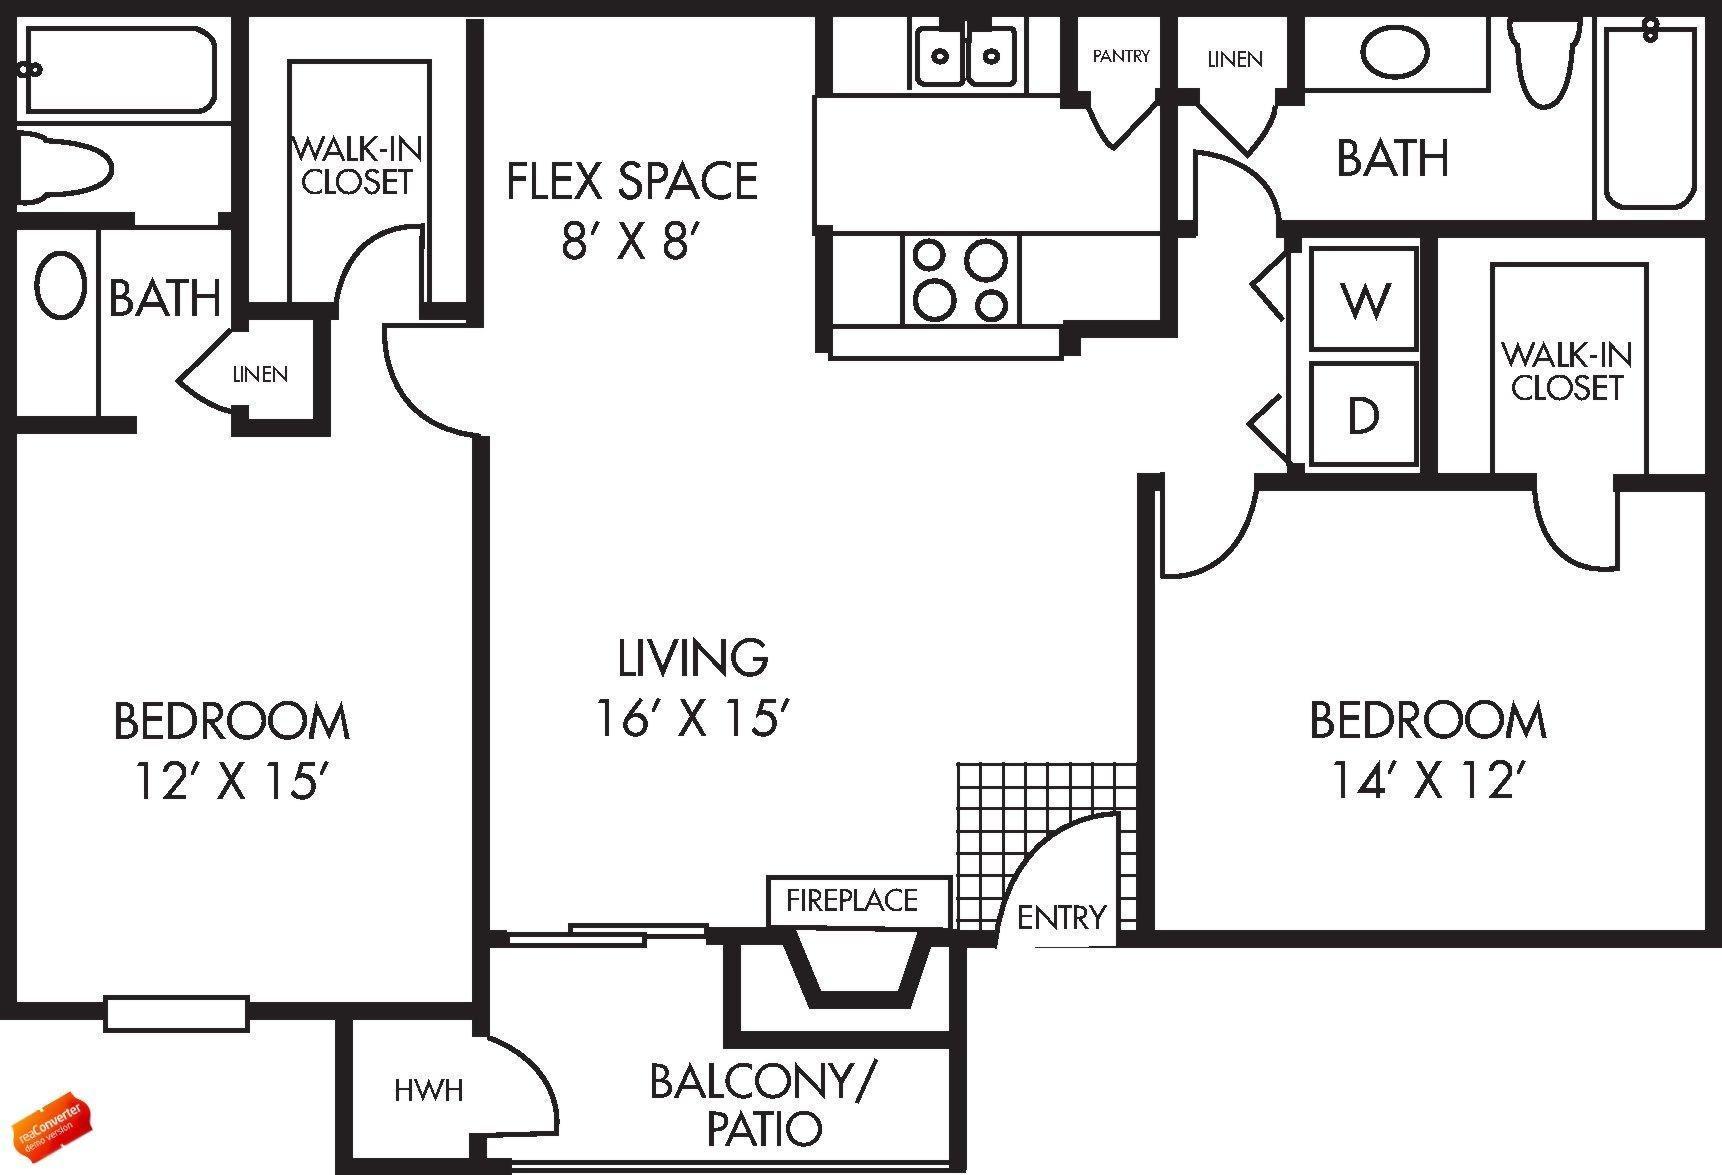 Augusta Floor Plan 2 bed 2 bath 1040 square feet with Balcony / Patio - Houston Texas Apartment Layout